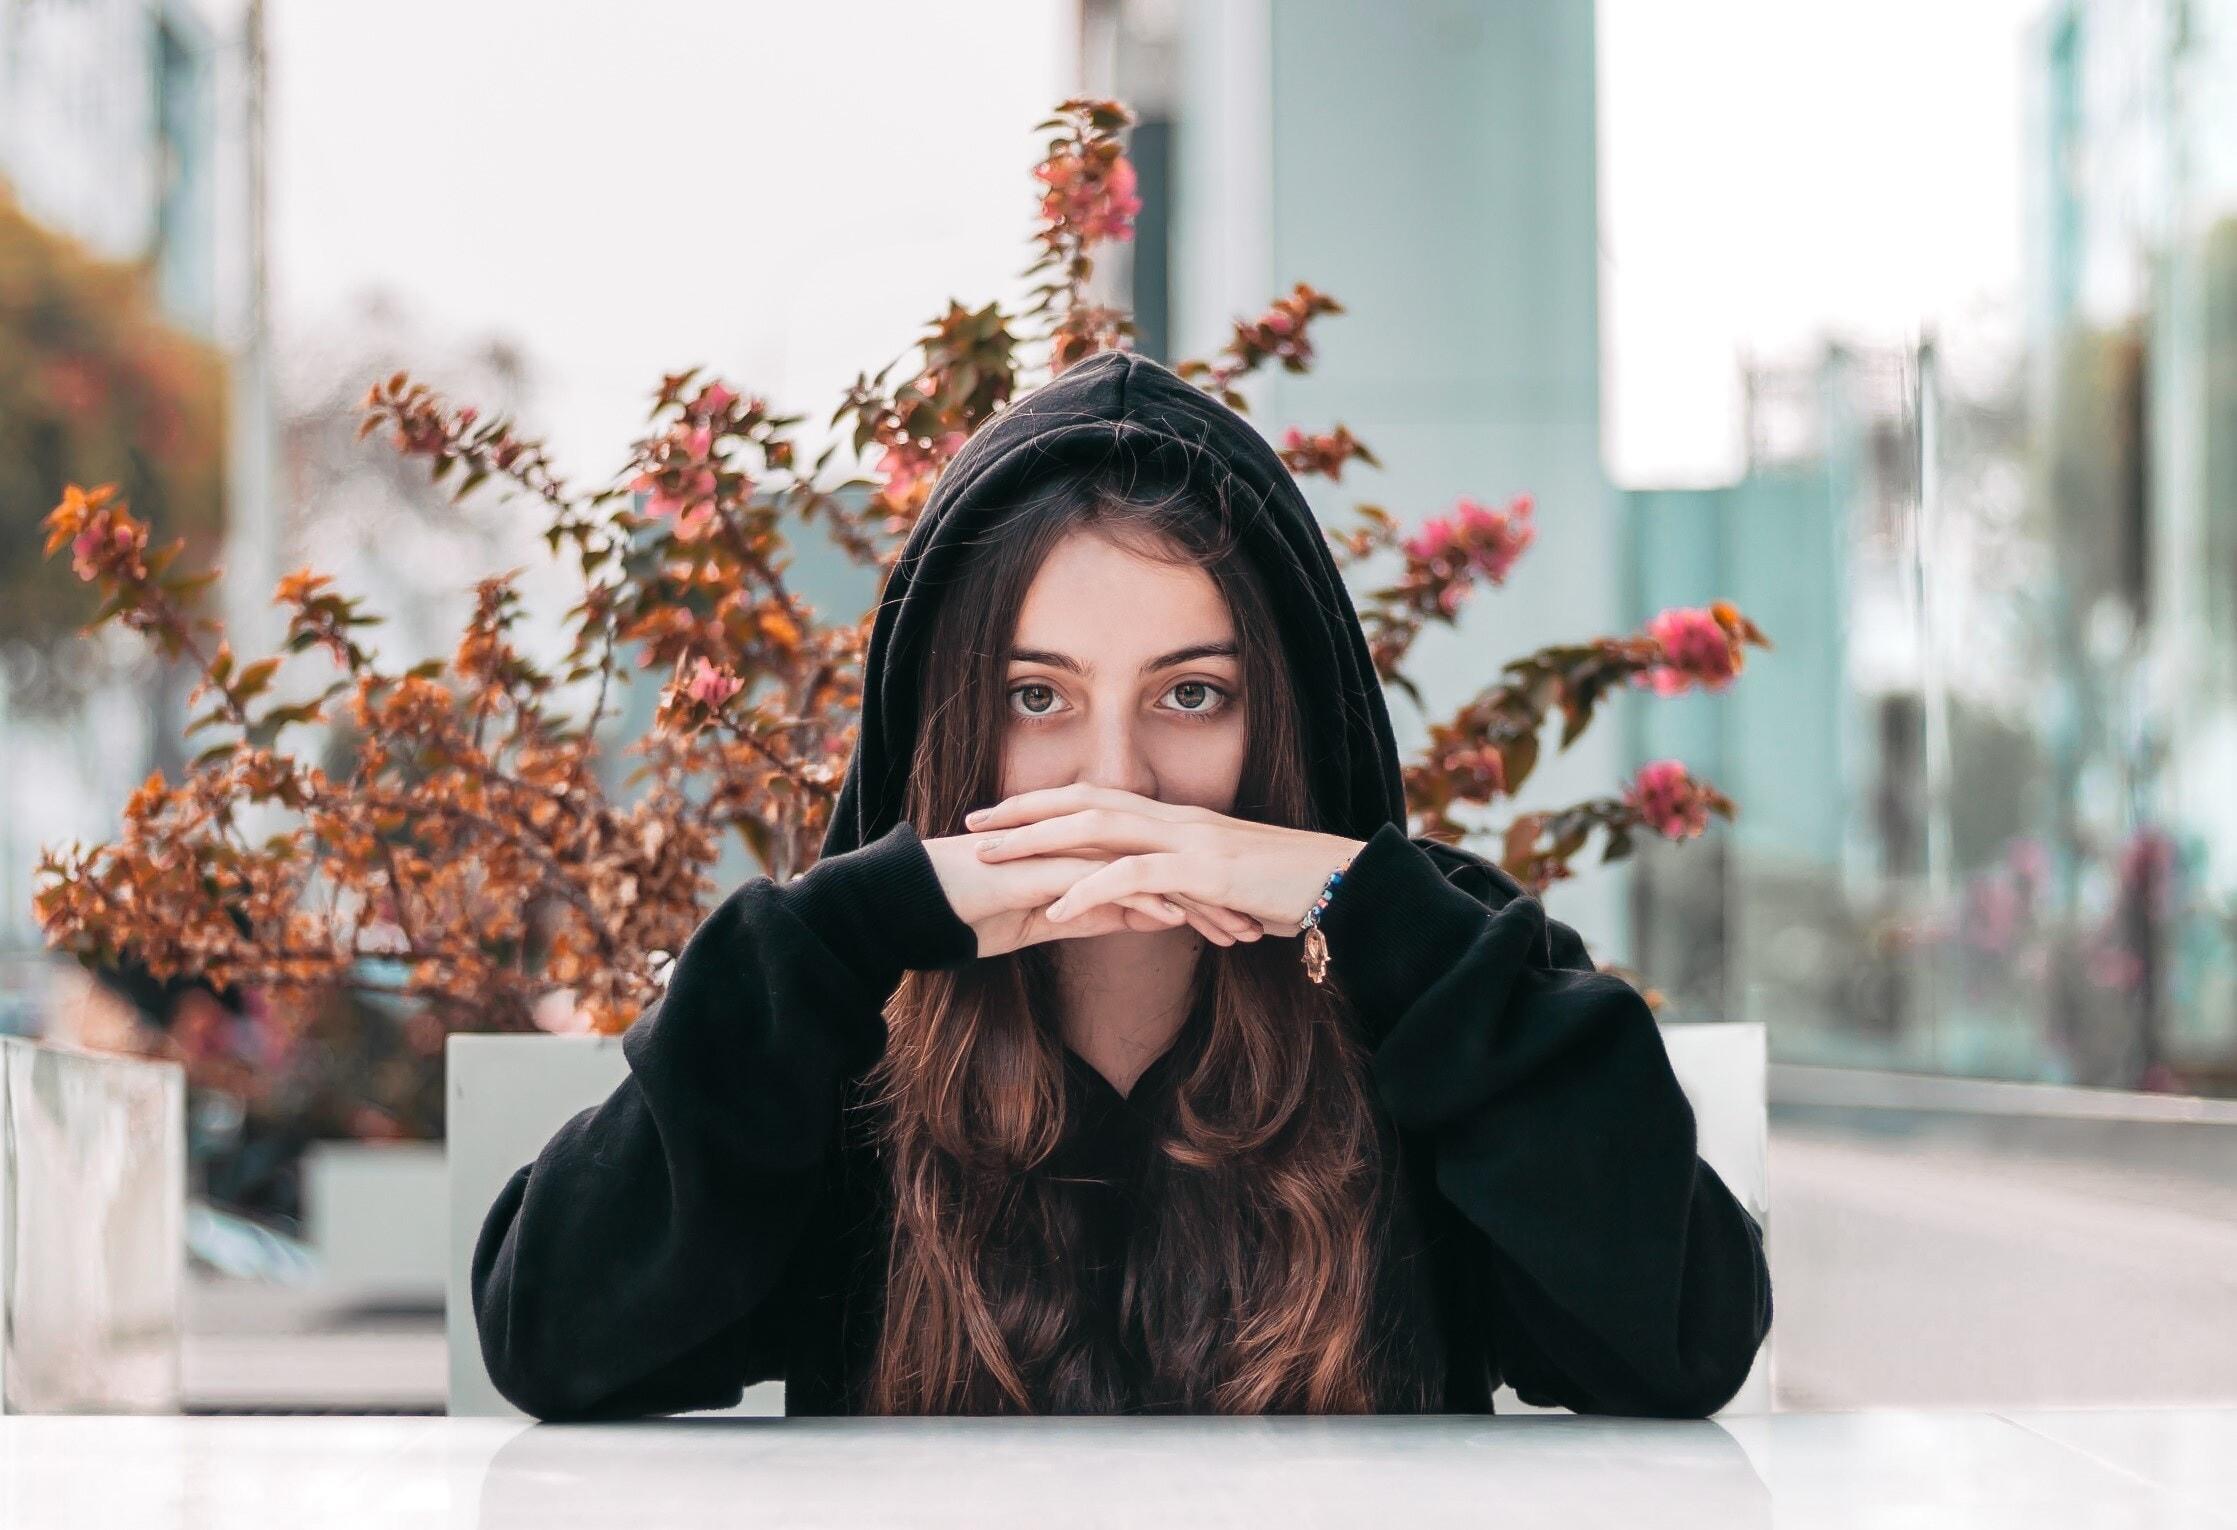 Легкое дыхание: как избавиться от запаха чеснока изо рта